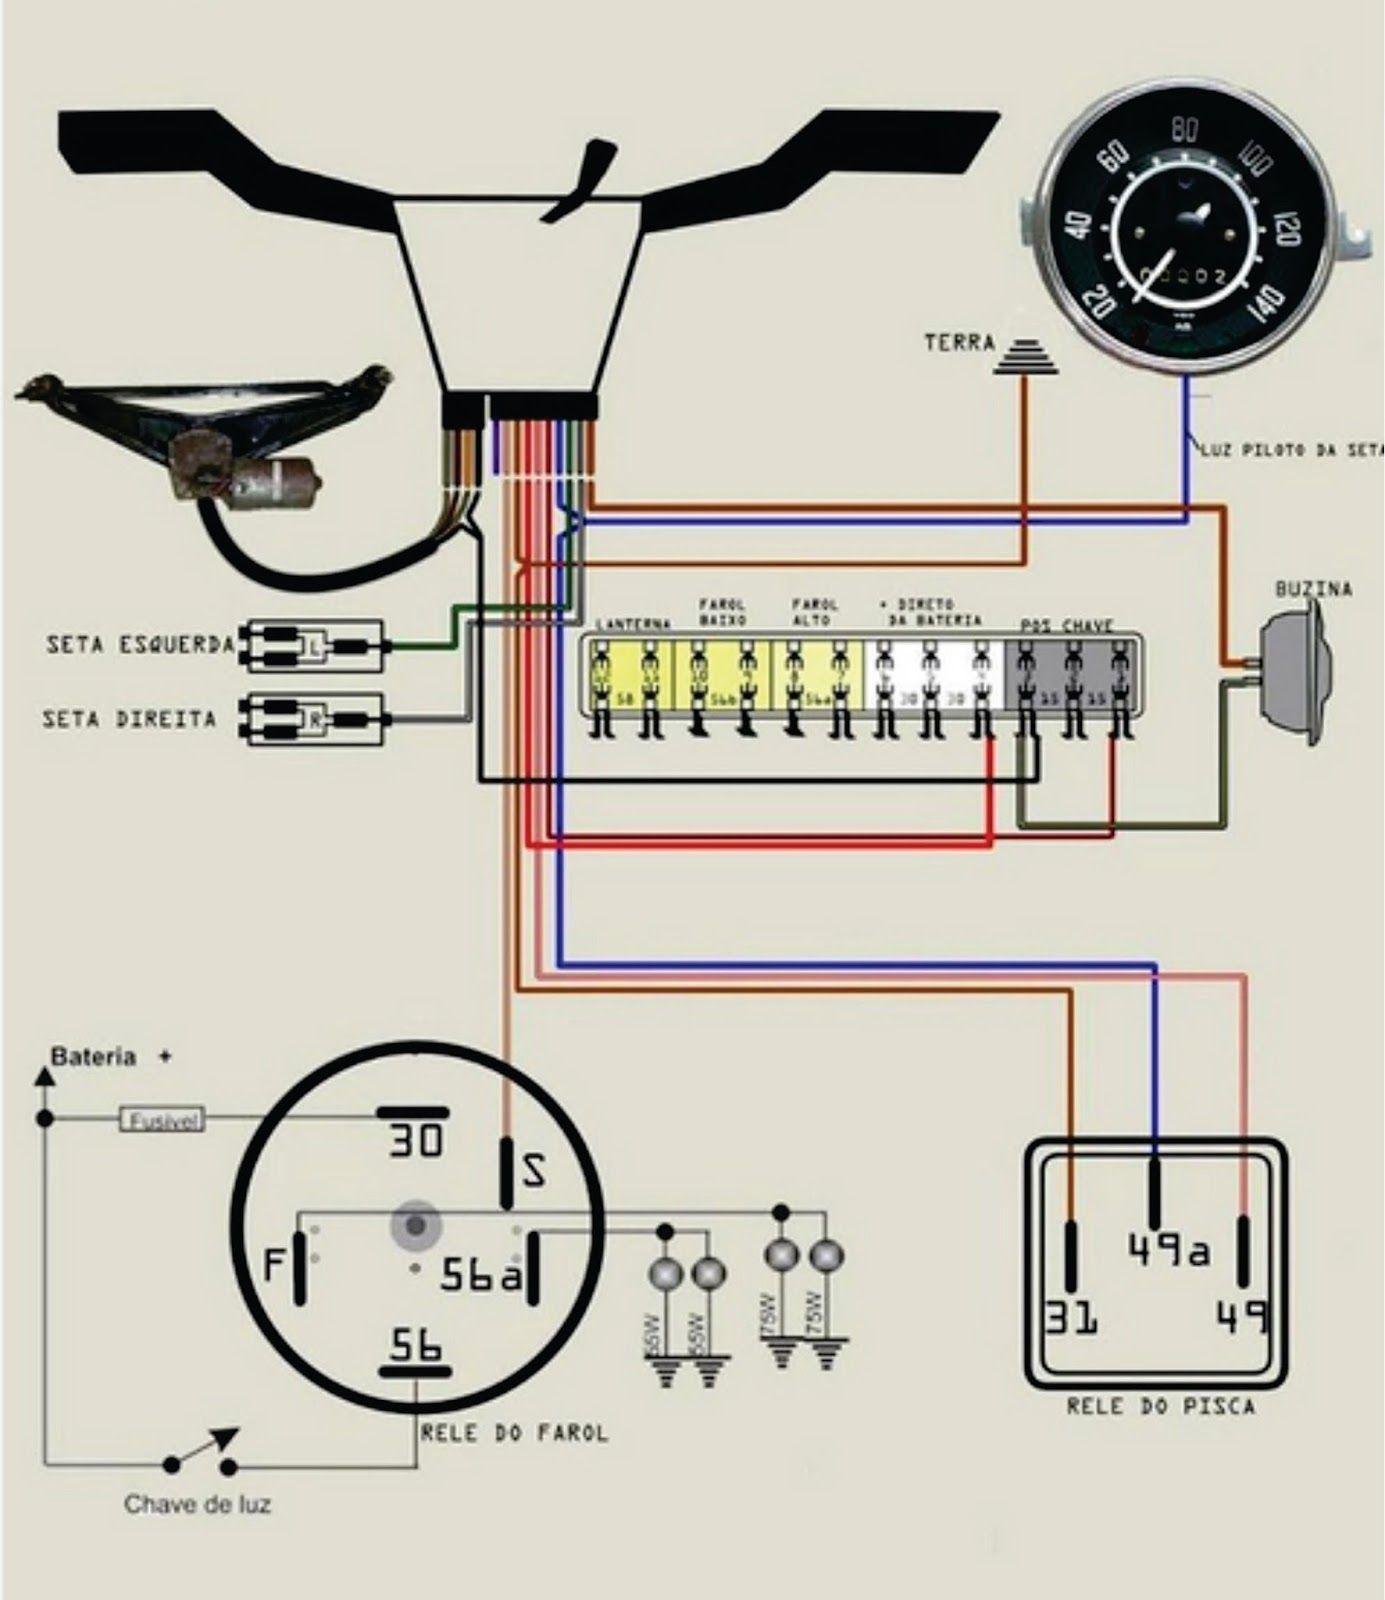 esquema 12 volts esquema eltrico fusca completo buggy